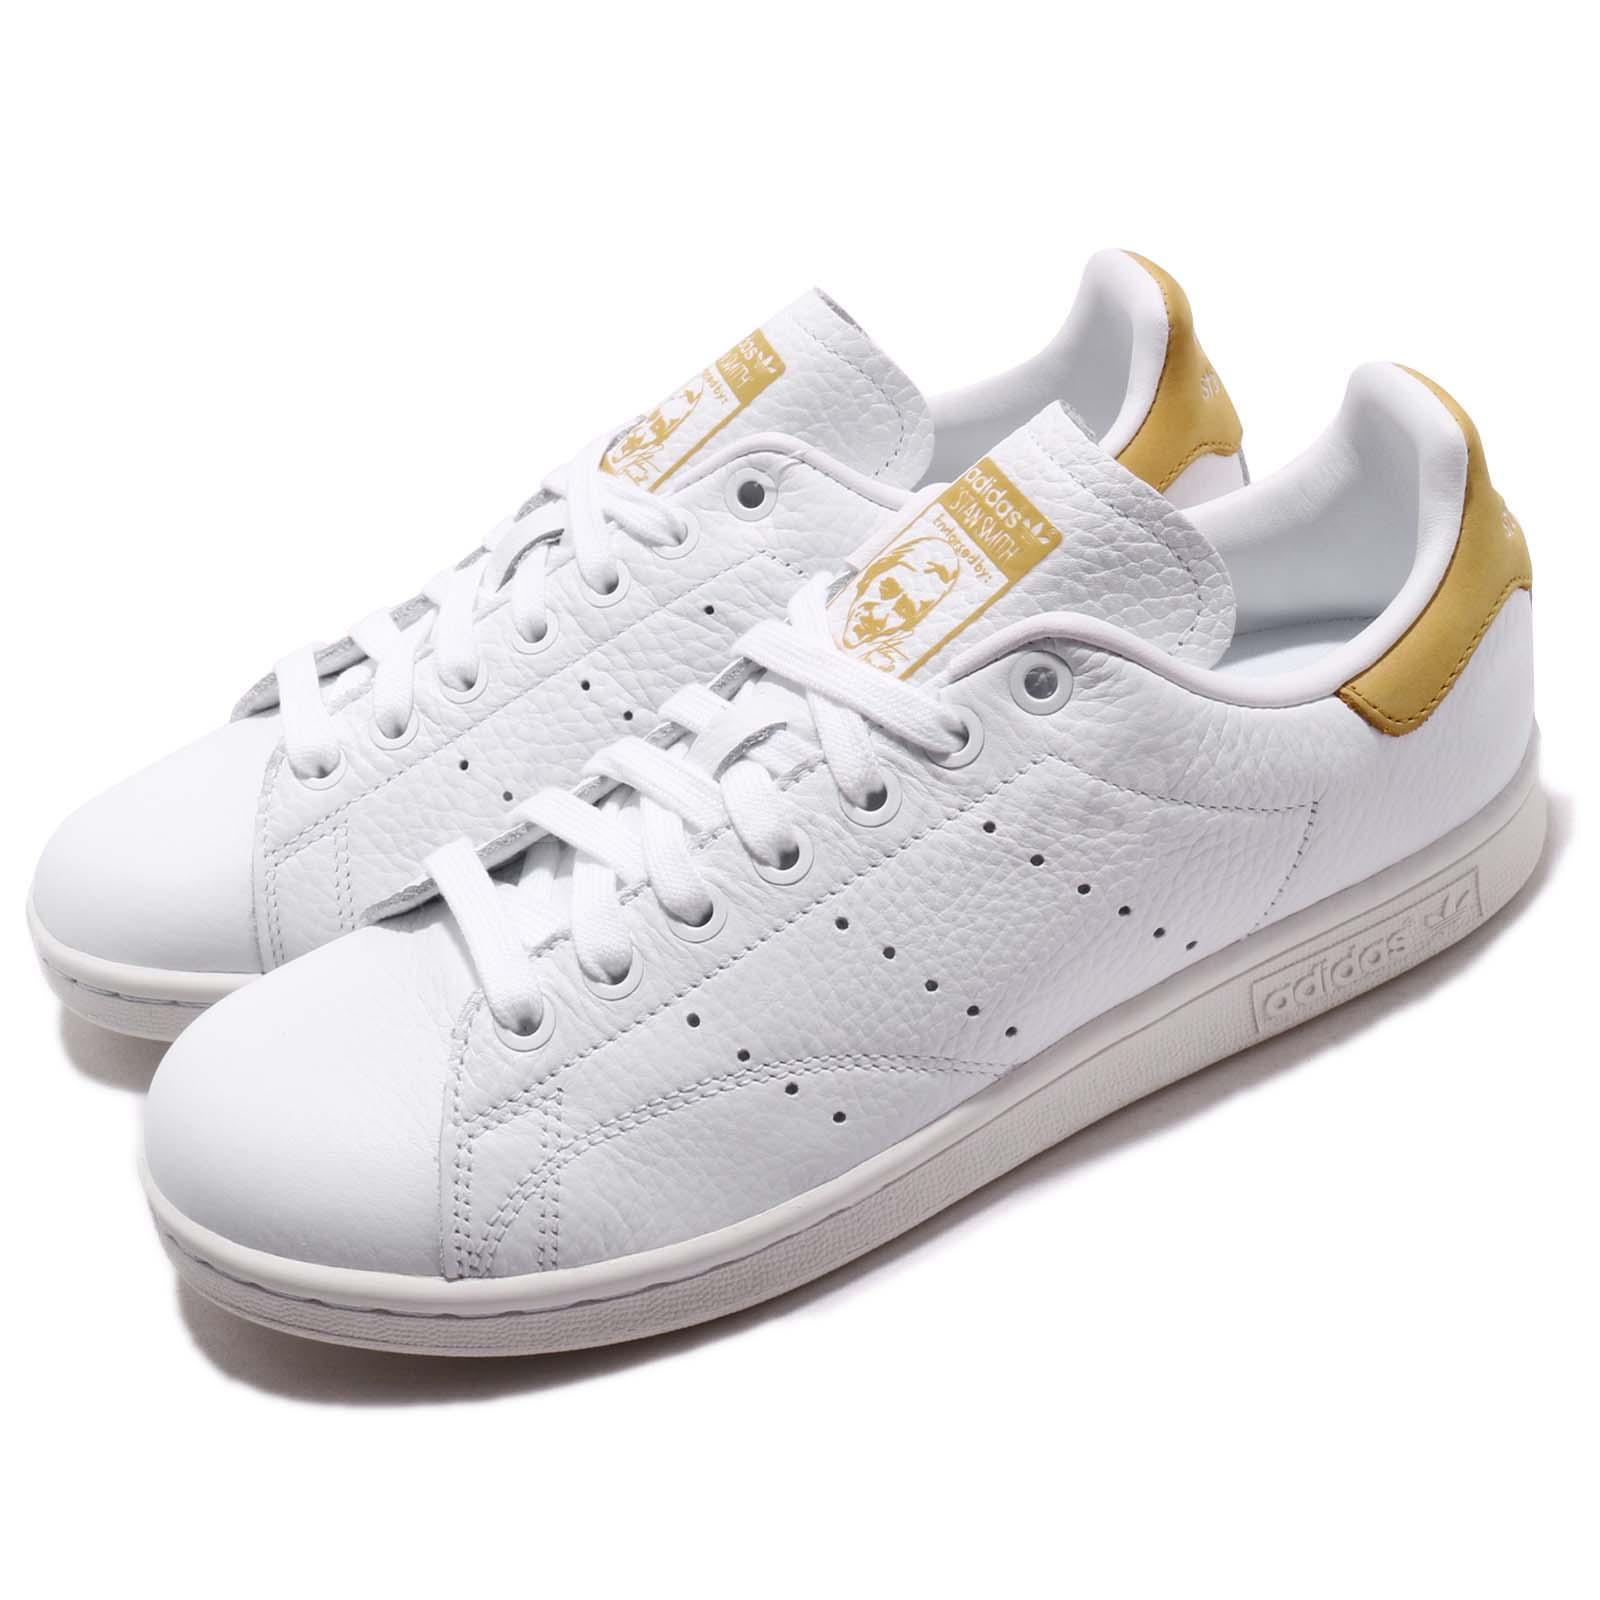 Adidas Originals Stan Smith blanc Raw Ochre Men Casual chaussures baskets BD7437